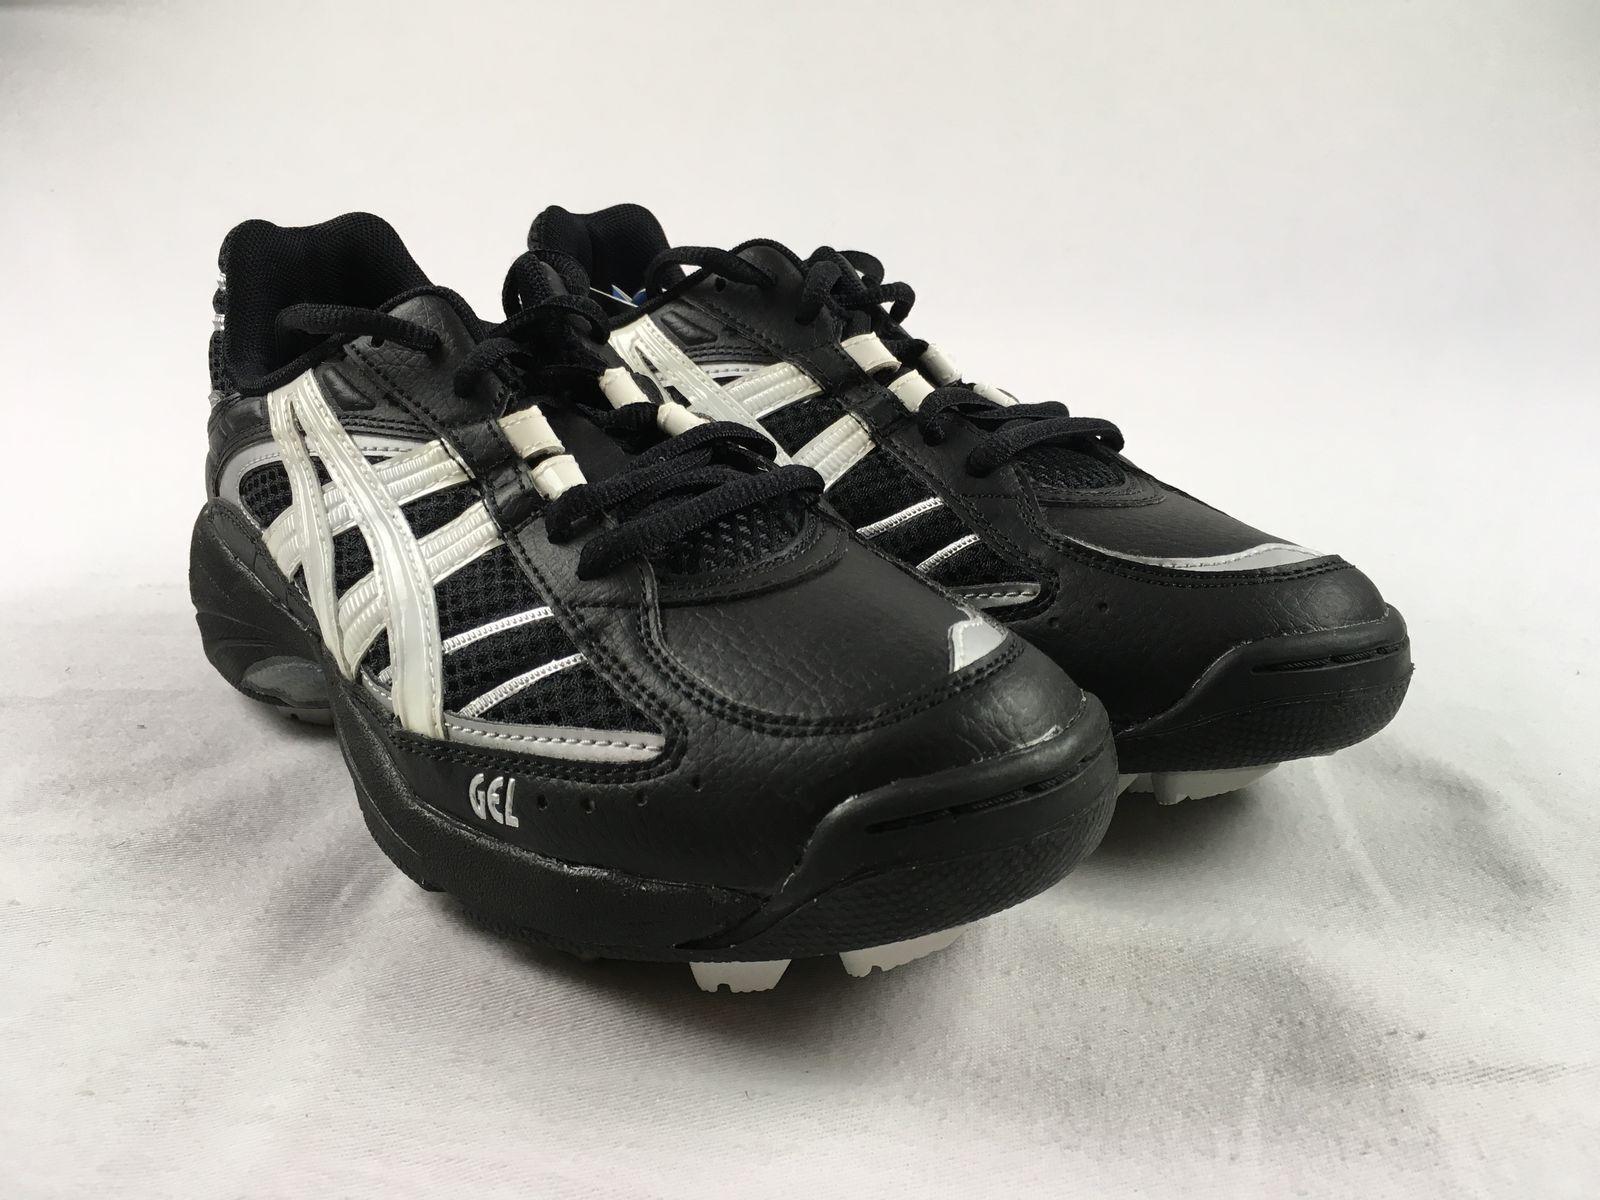 NEW Asics Asics Gel Hockey Black Heath - Black Cleats (Women's Multiple Sizes)